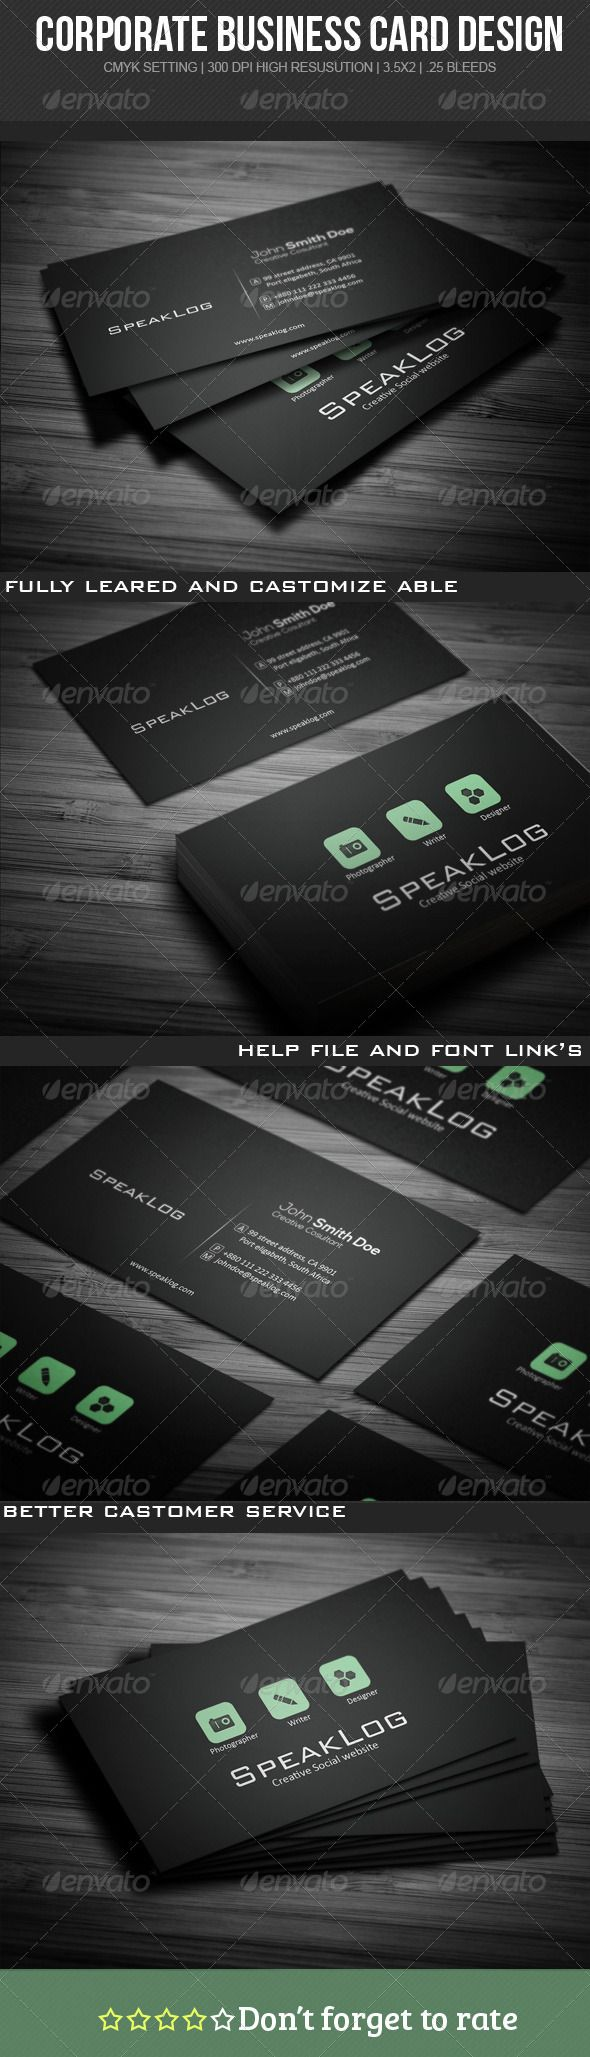 best 25+ calibri font ideas on pinterest | special characters, Presentation templates